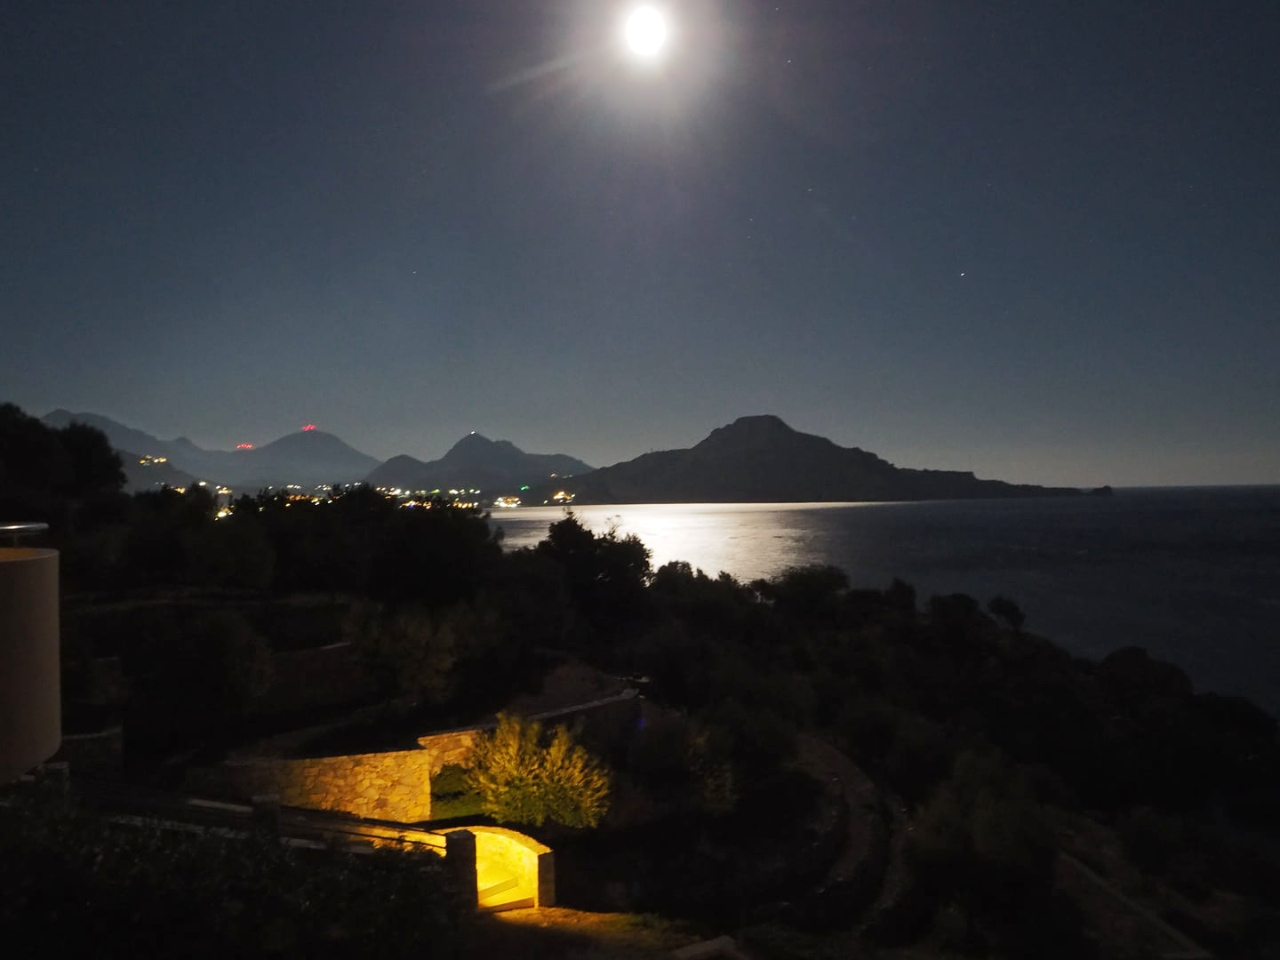 Full moon over Plakias - South Rethimno - Crete